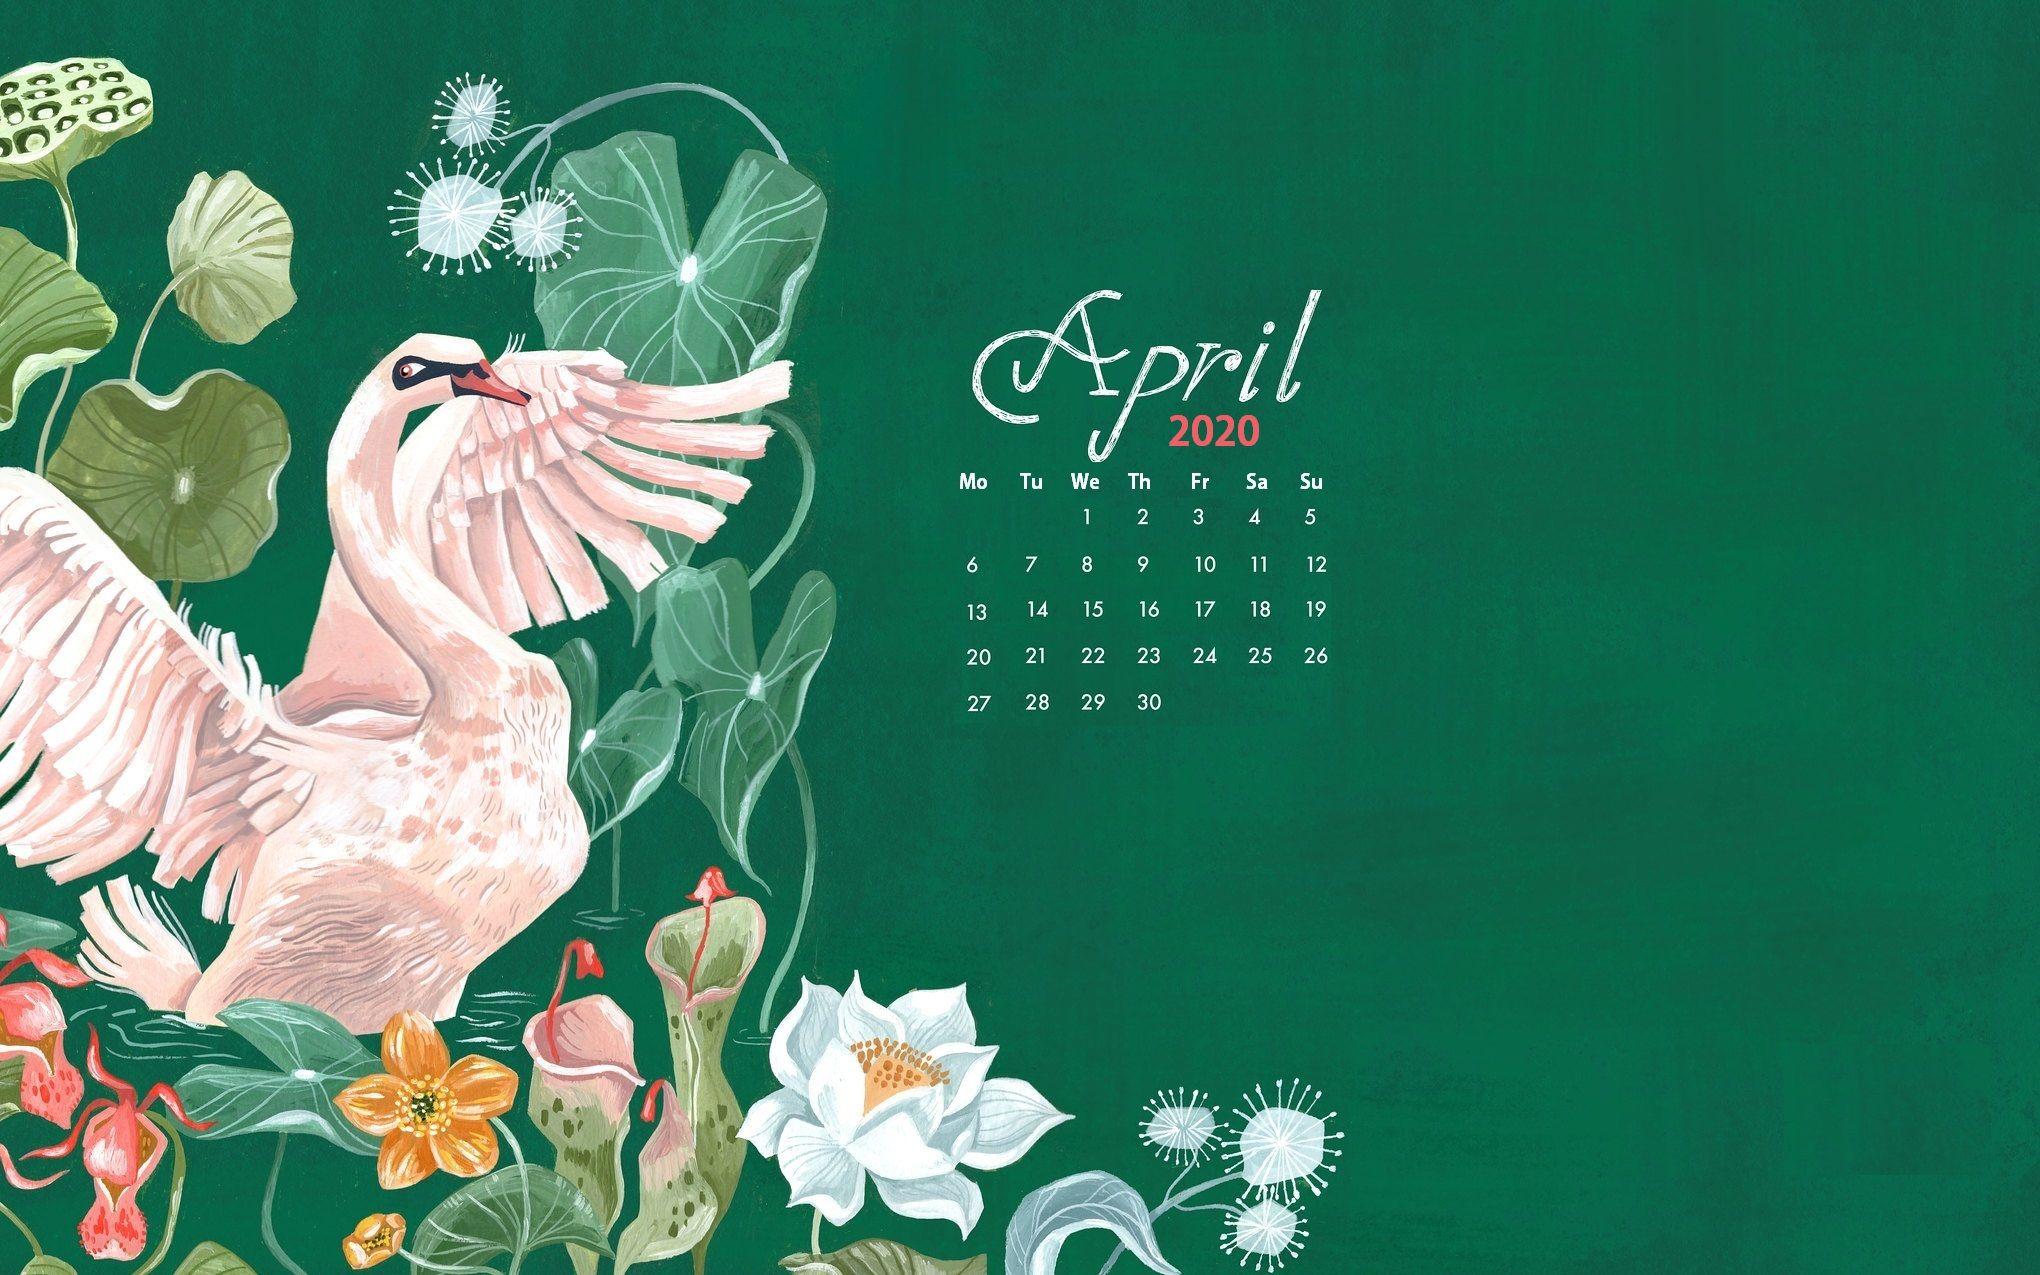 Floral April 2020 Calendar Screensaver